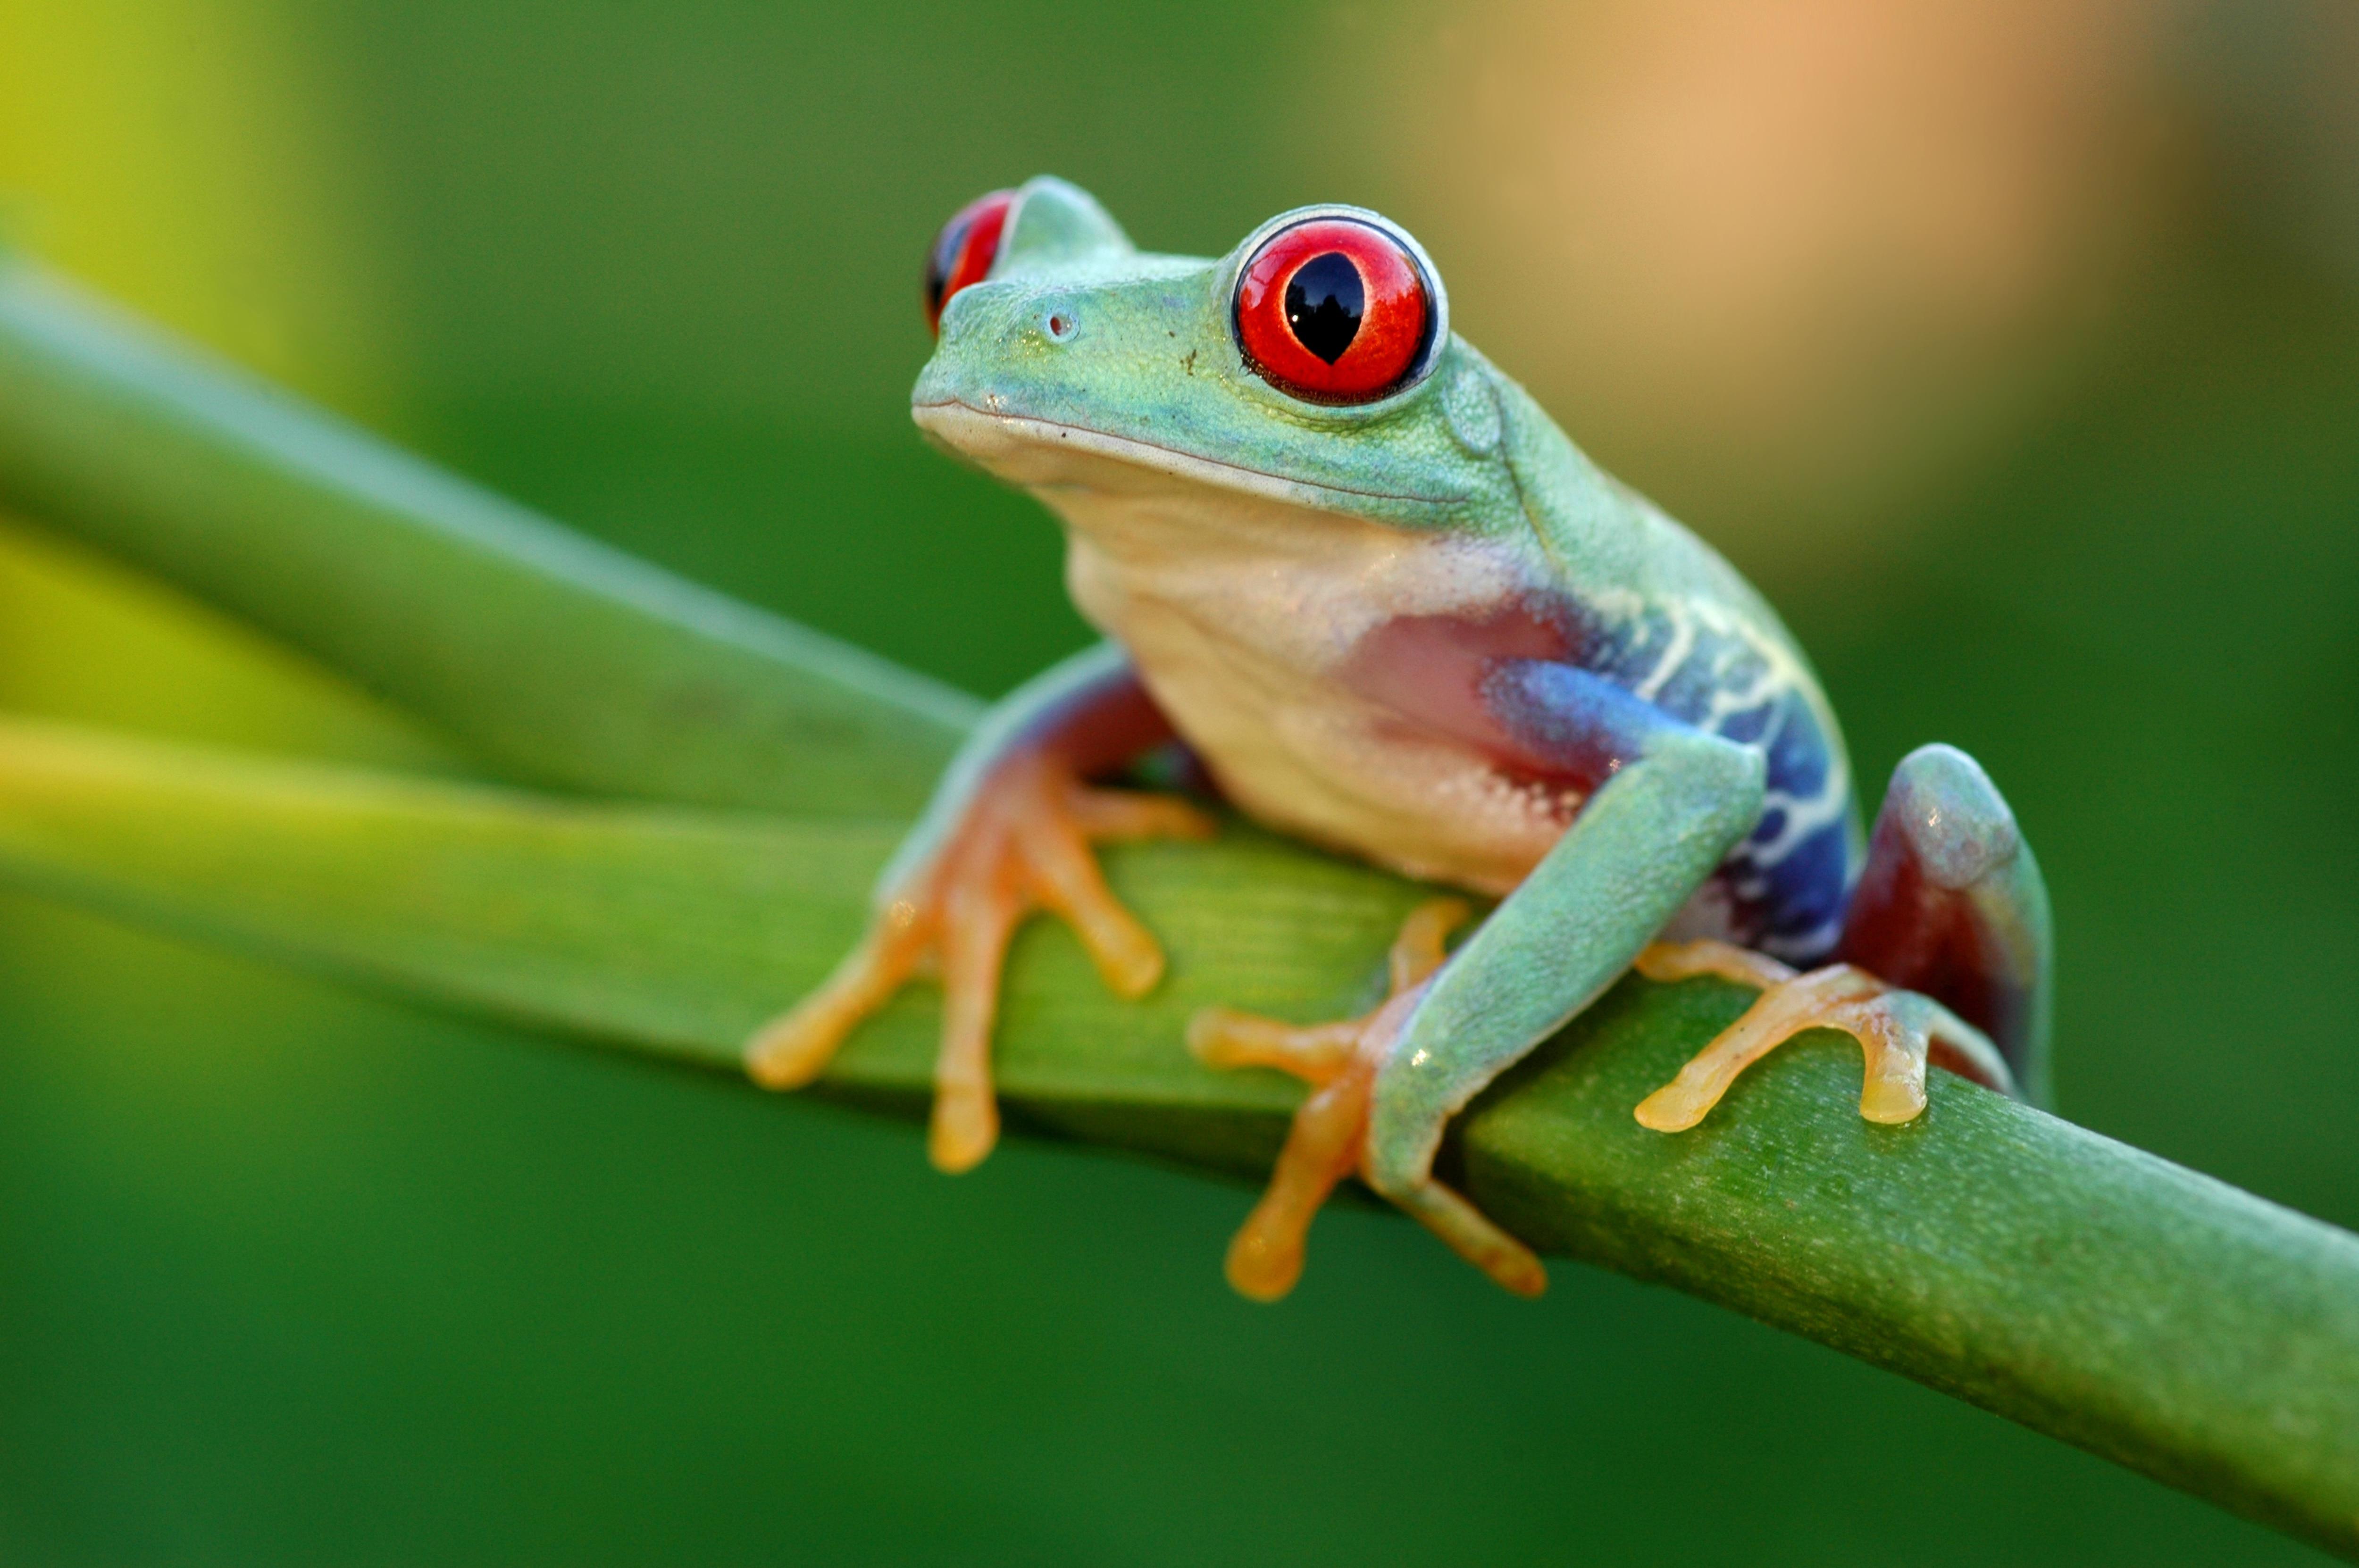 frog s metamorphosis wedo 2 0 science lesson plans lego education